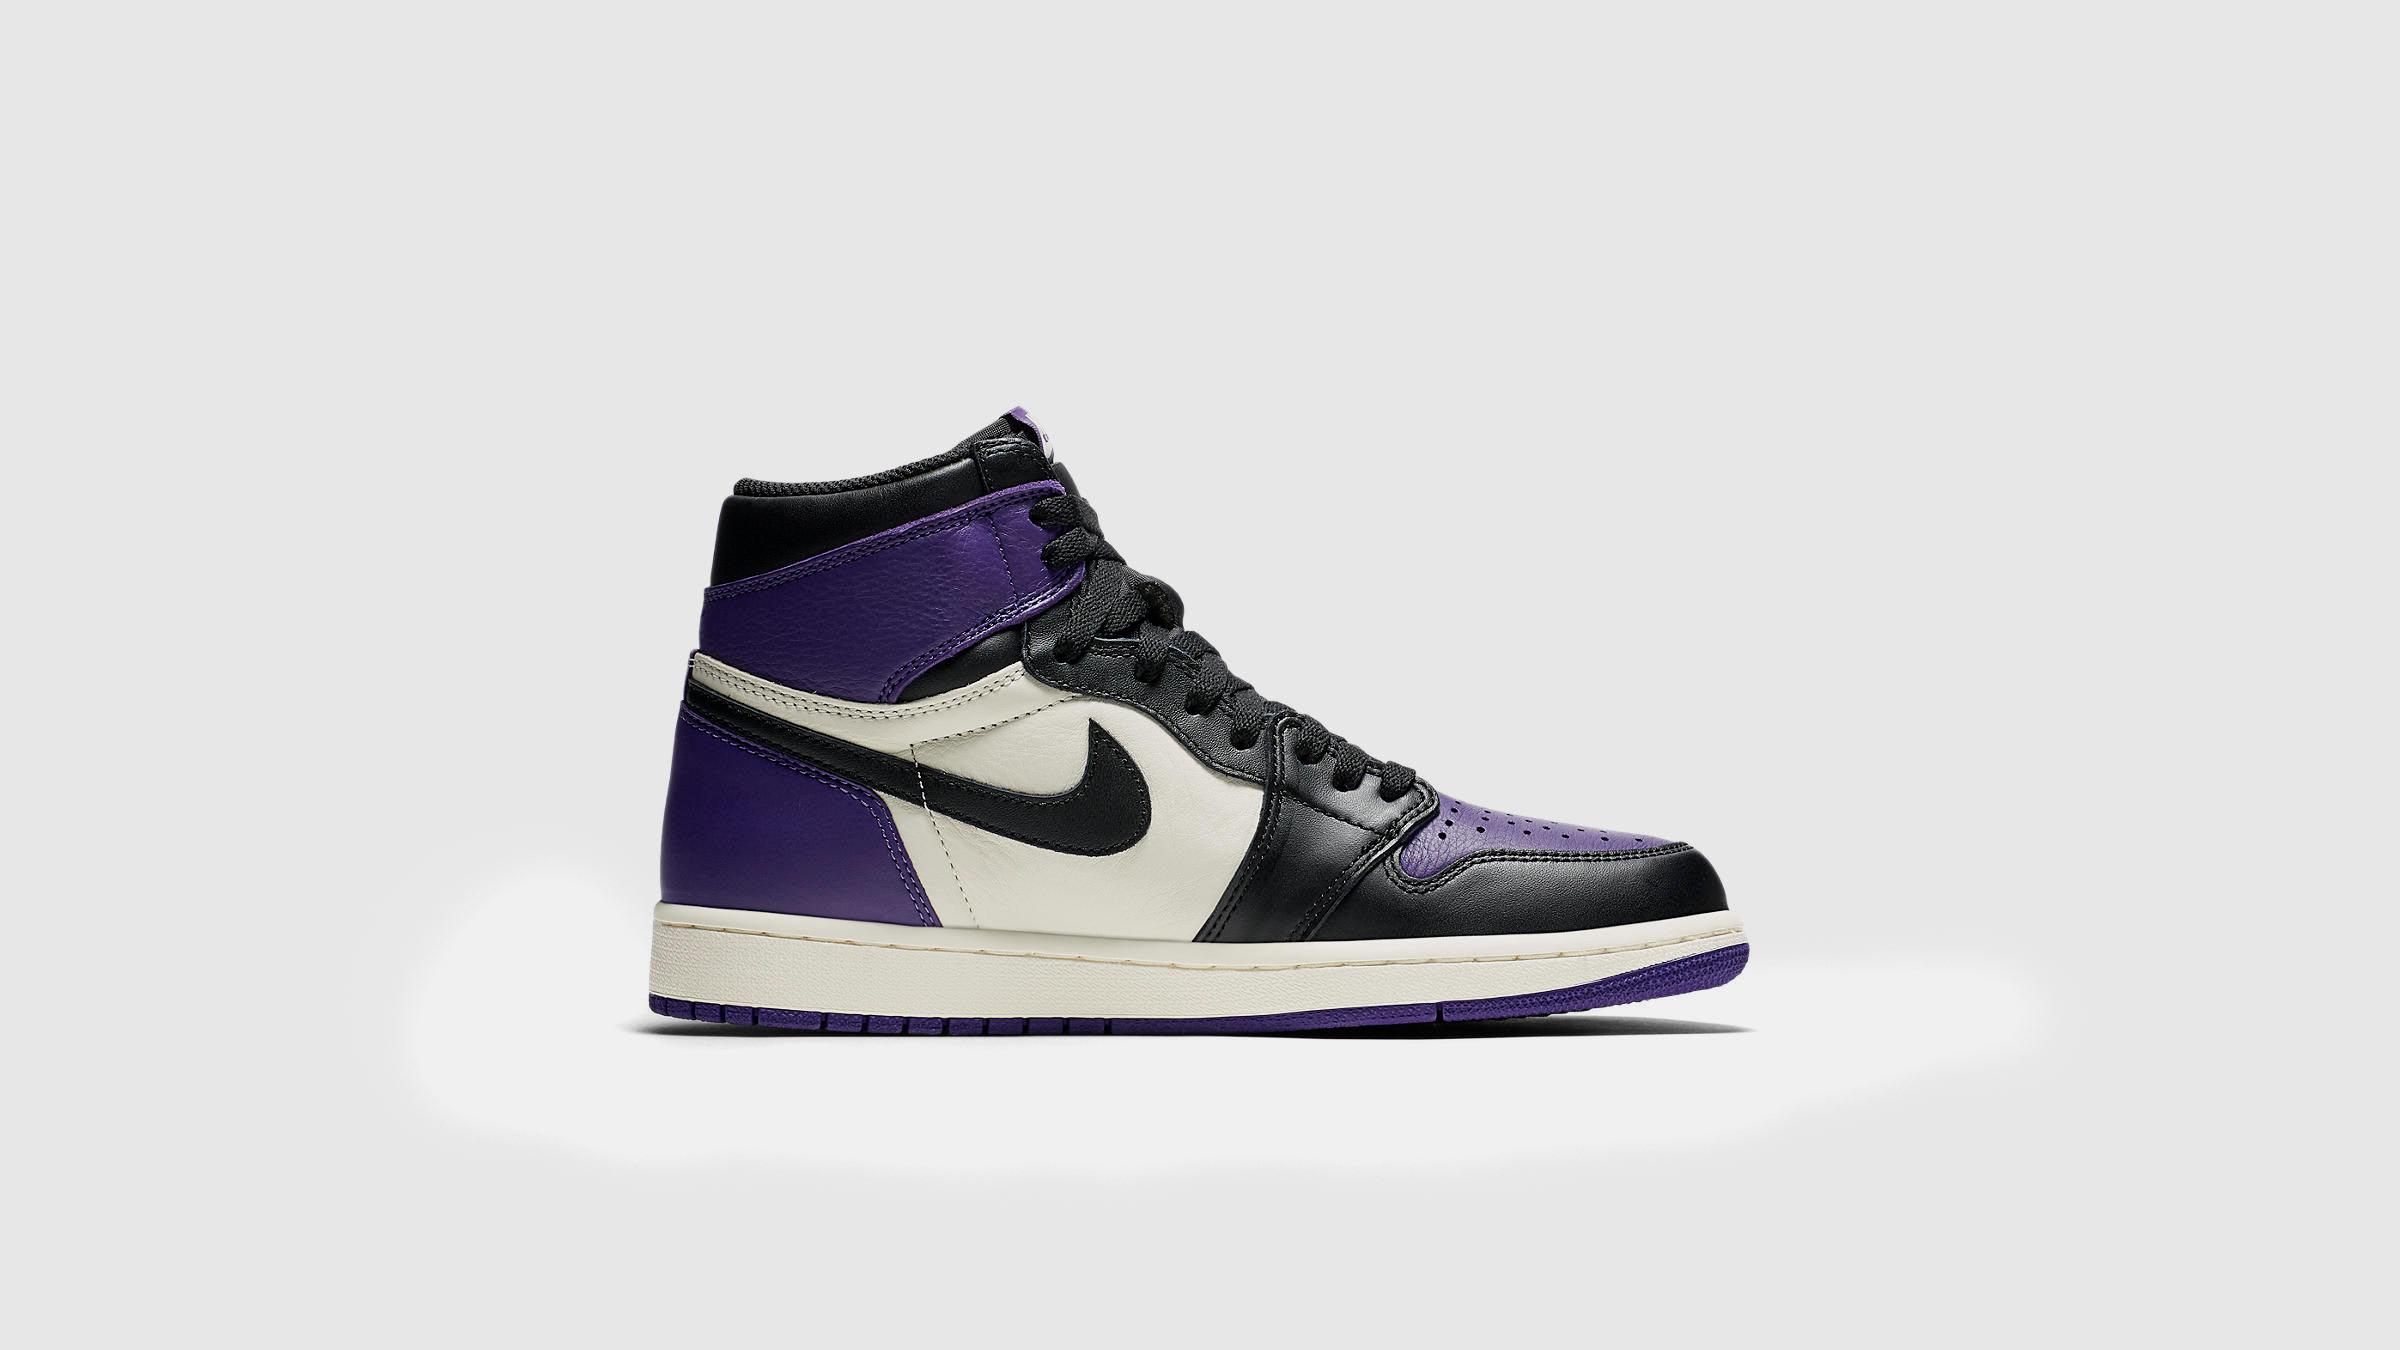 new style 0dd06 0097b Nike Air Jordan 1 Retro High OG. Court Purple   White£129. A new take on  the classic